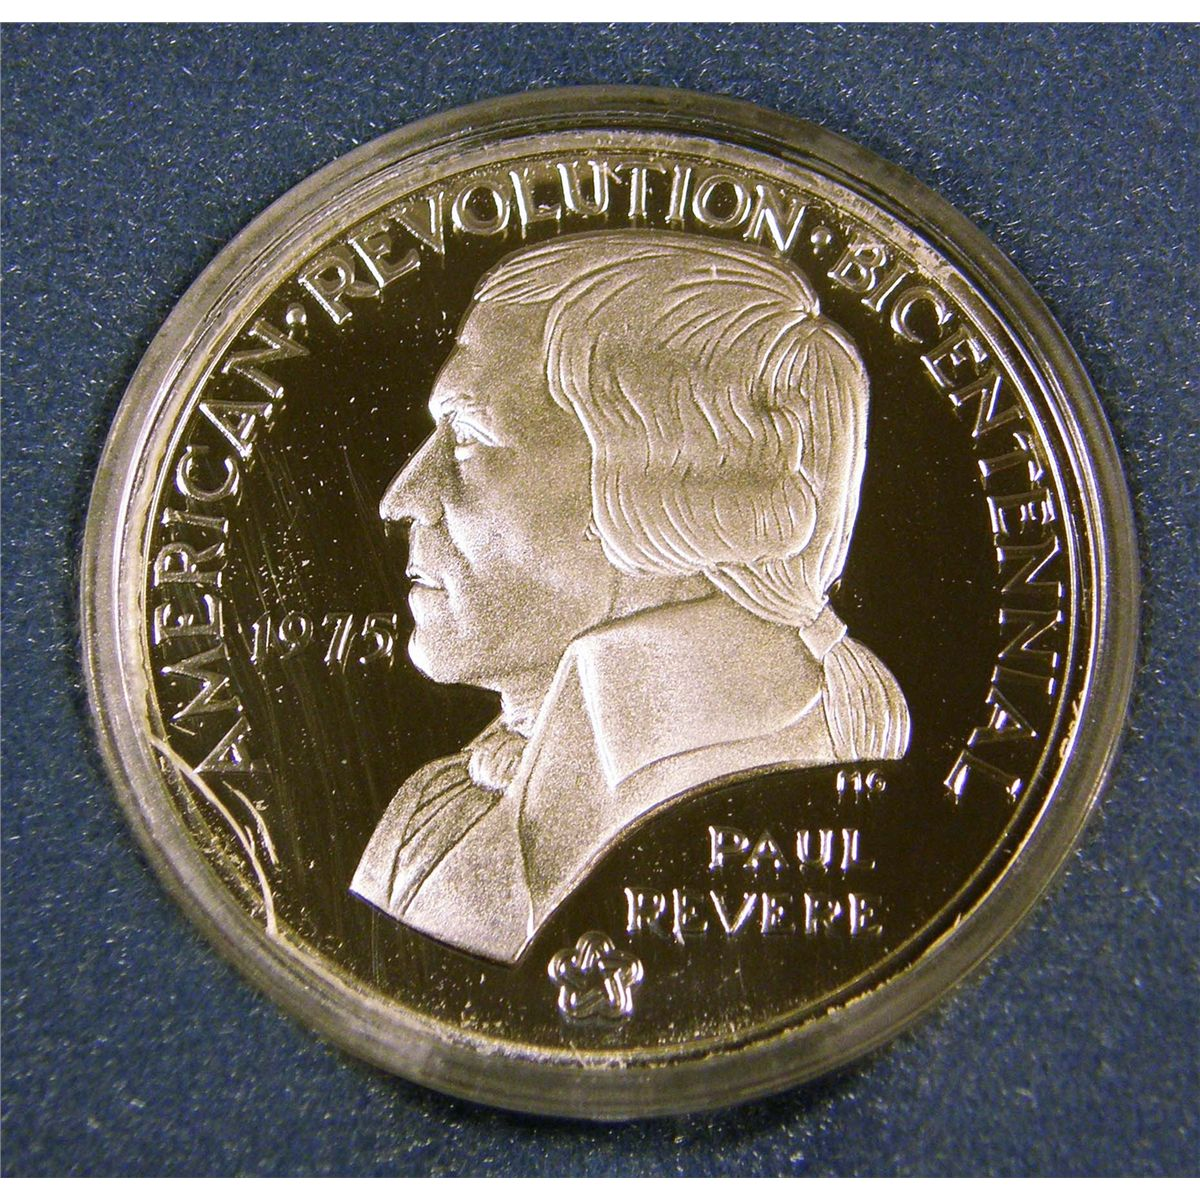 1975 Bicentennial Medal Commemorating Battles Of Lexington